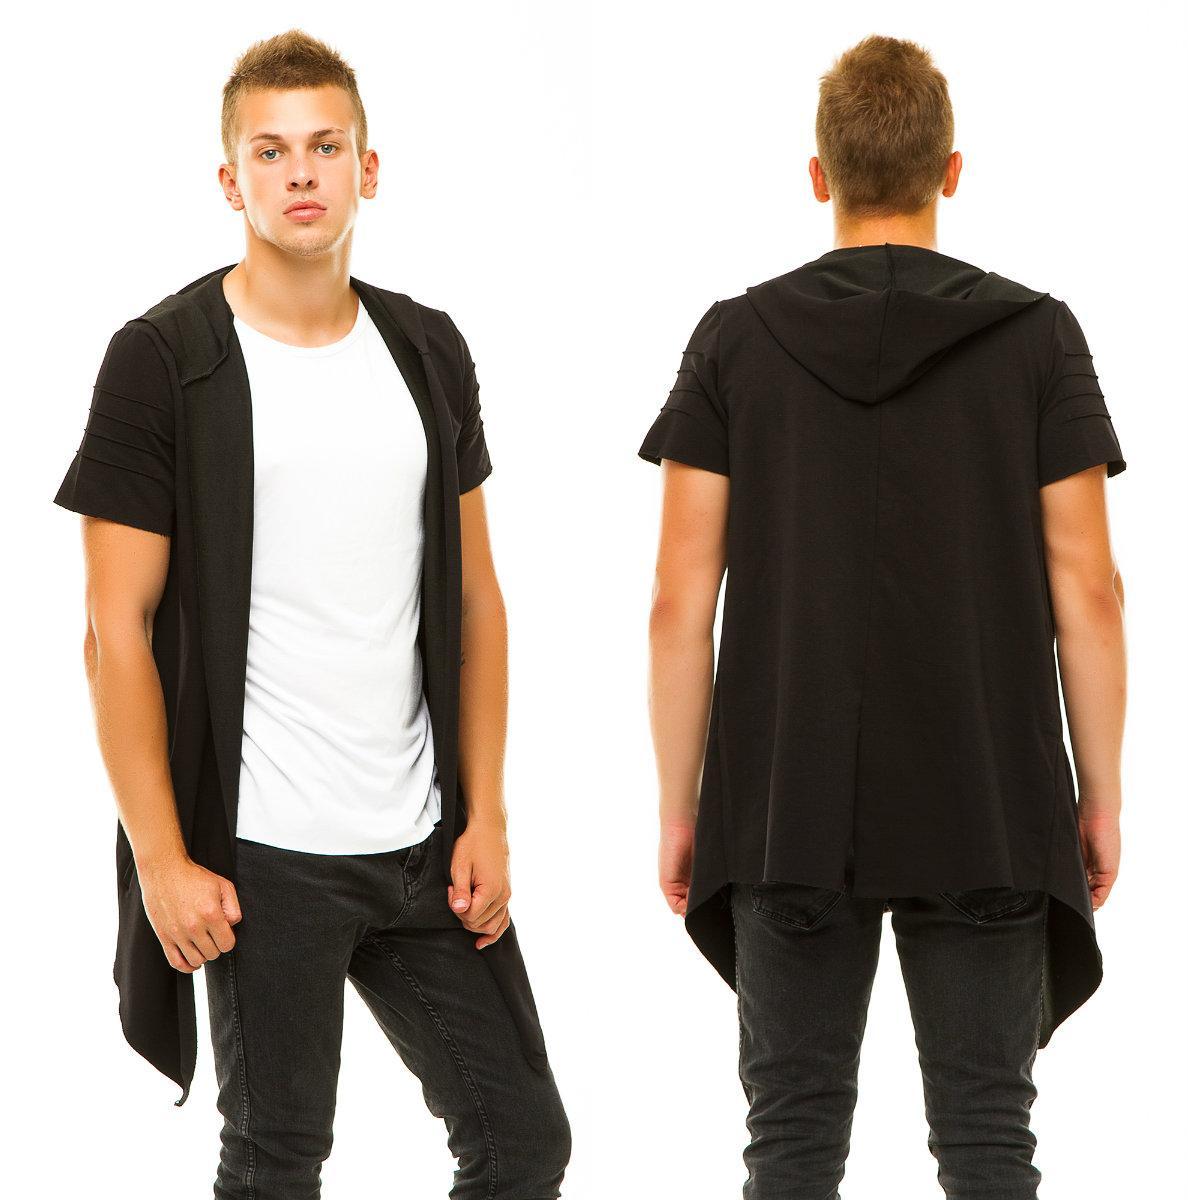 Мантия 348 с футболкой черная размер 52